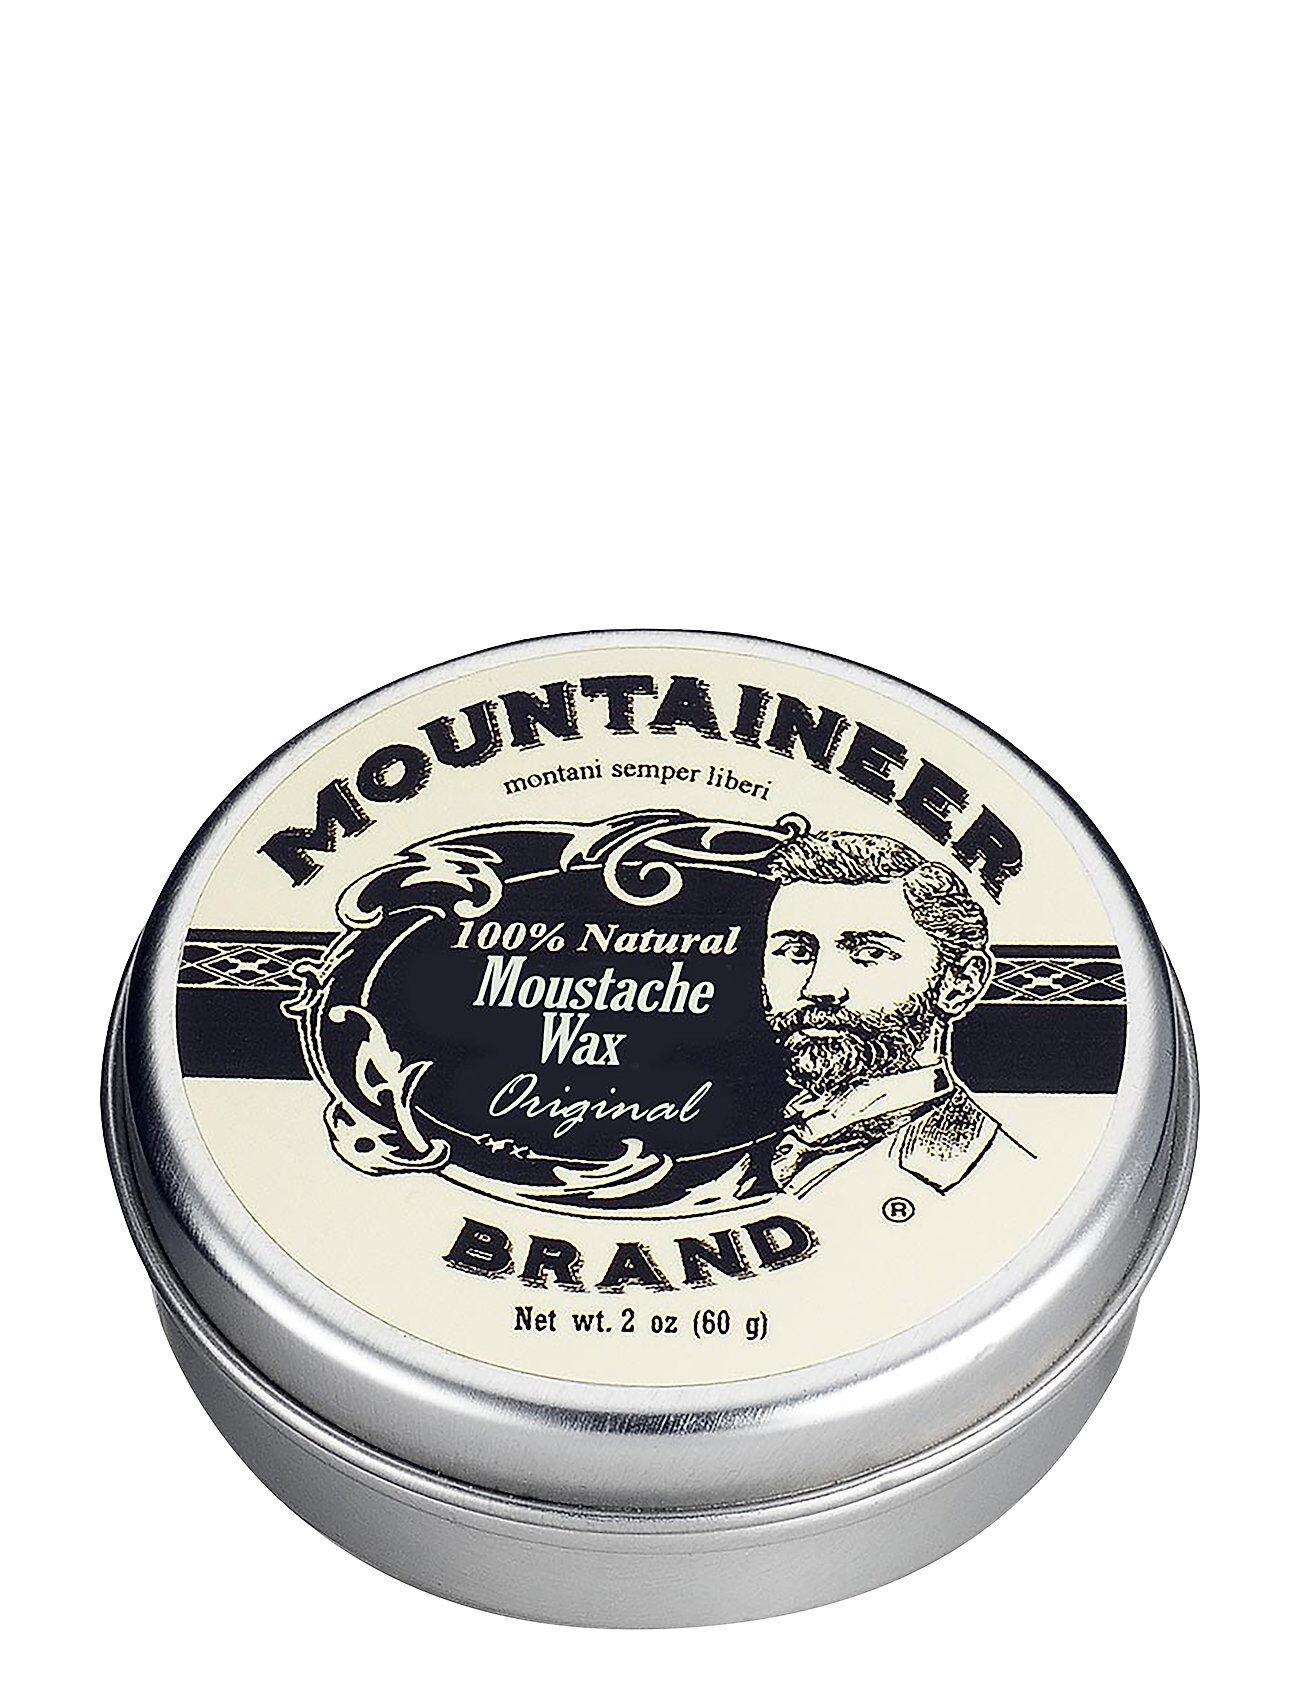 Mountaineer Brand Moustache Wax Beauty MEN Shaving Products Beard & Mustache Nude Mountaineer Brand